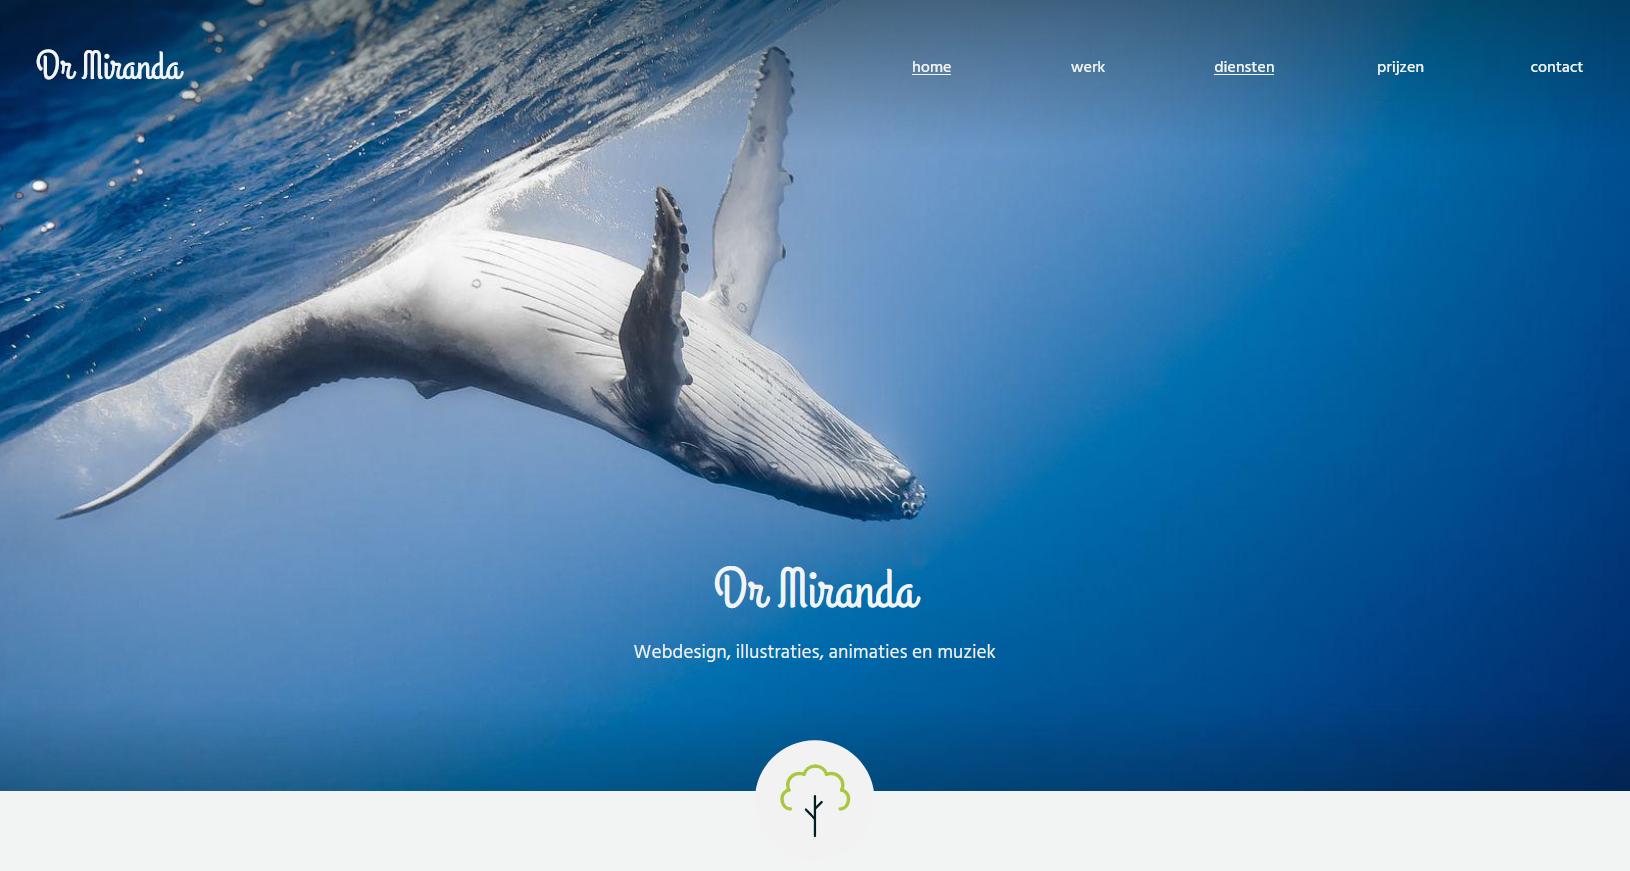 wijb.design portfolio gallery - hero